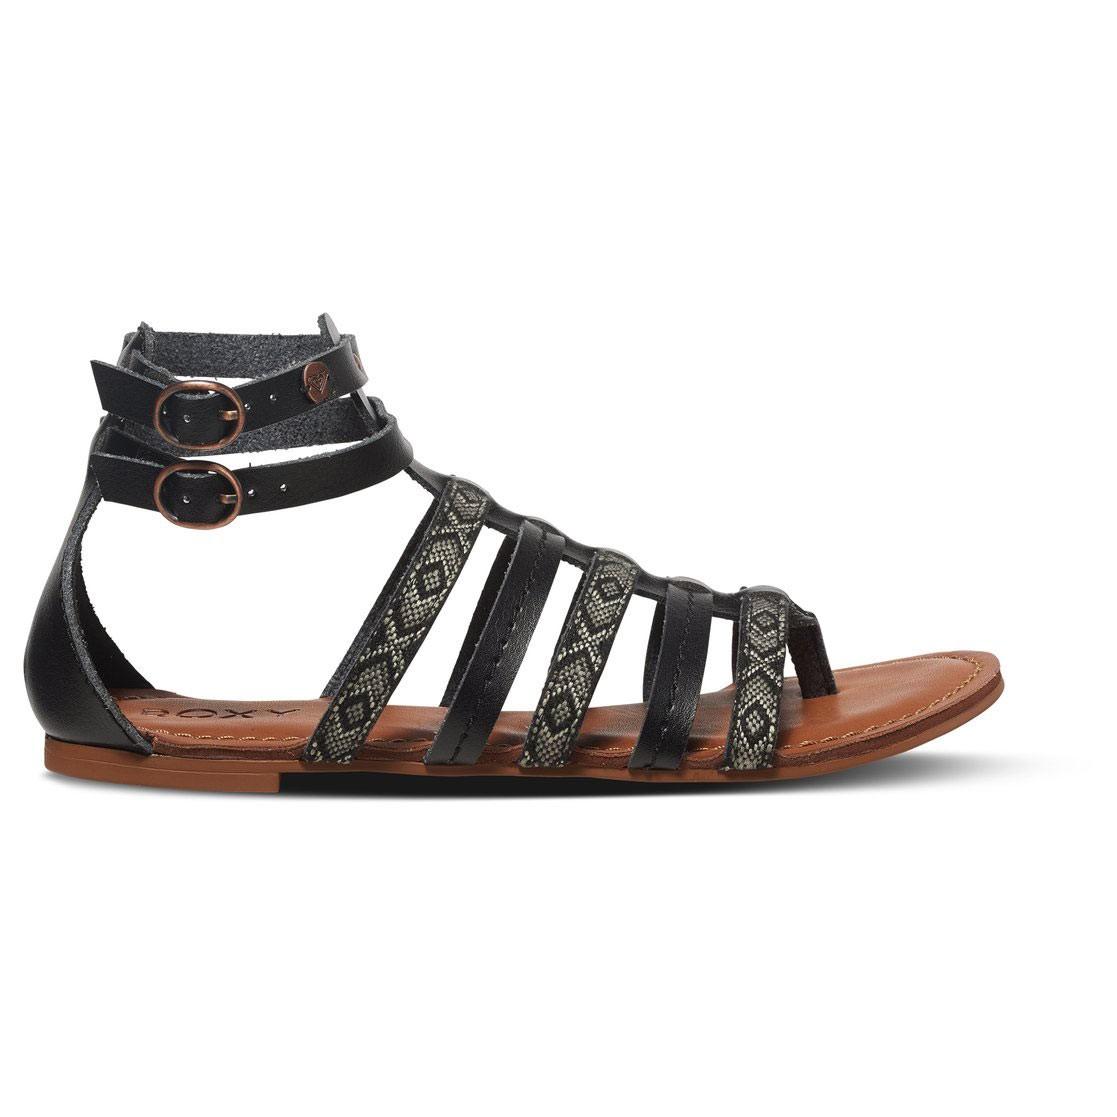 Roxy Womens Emilia Split Toe Casual Gladiator Sandals Tan Size 90